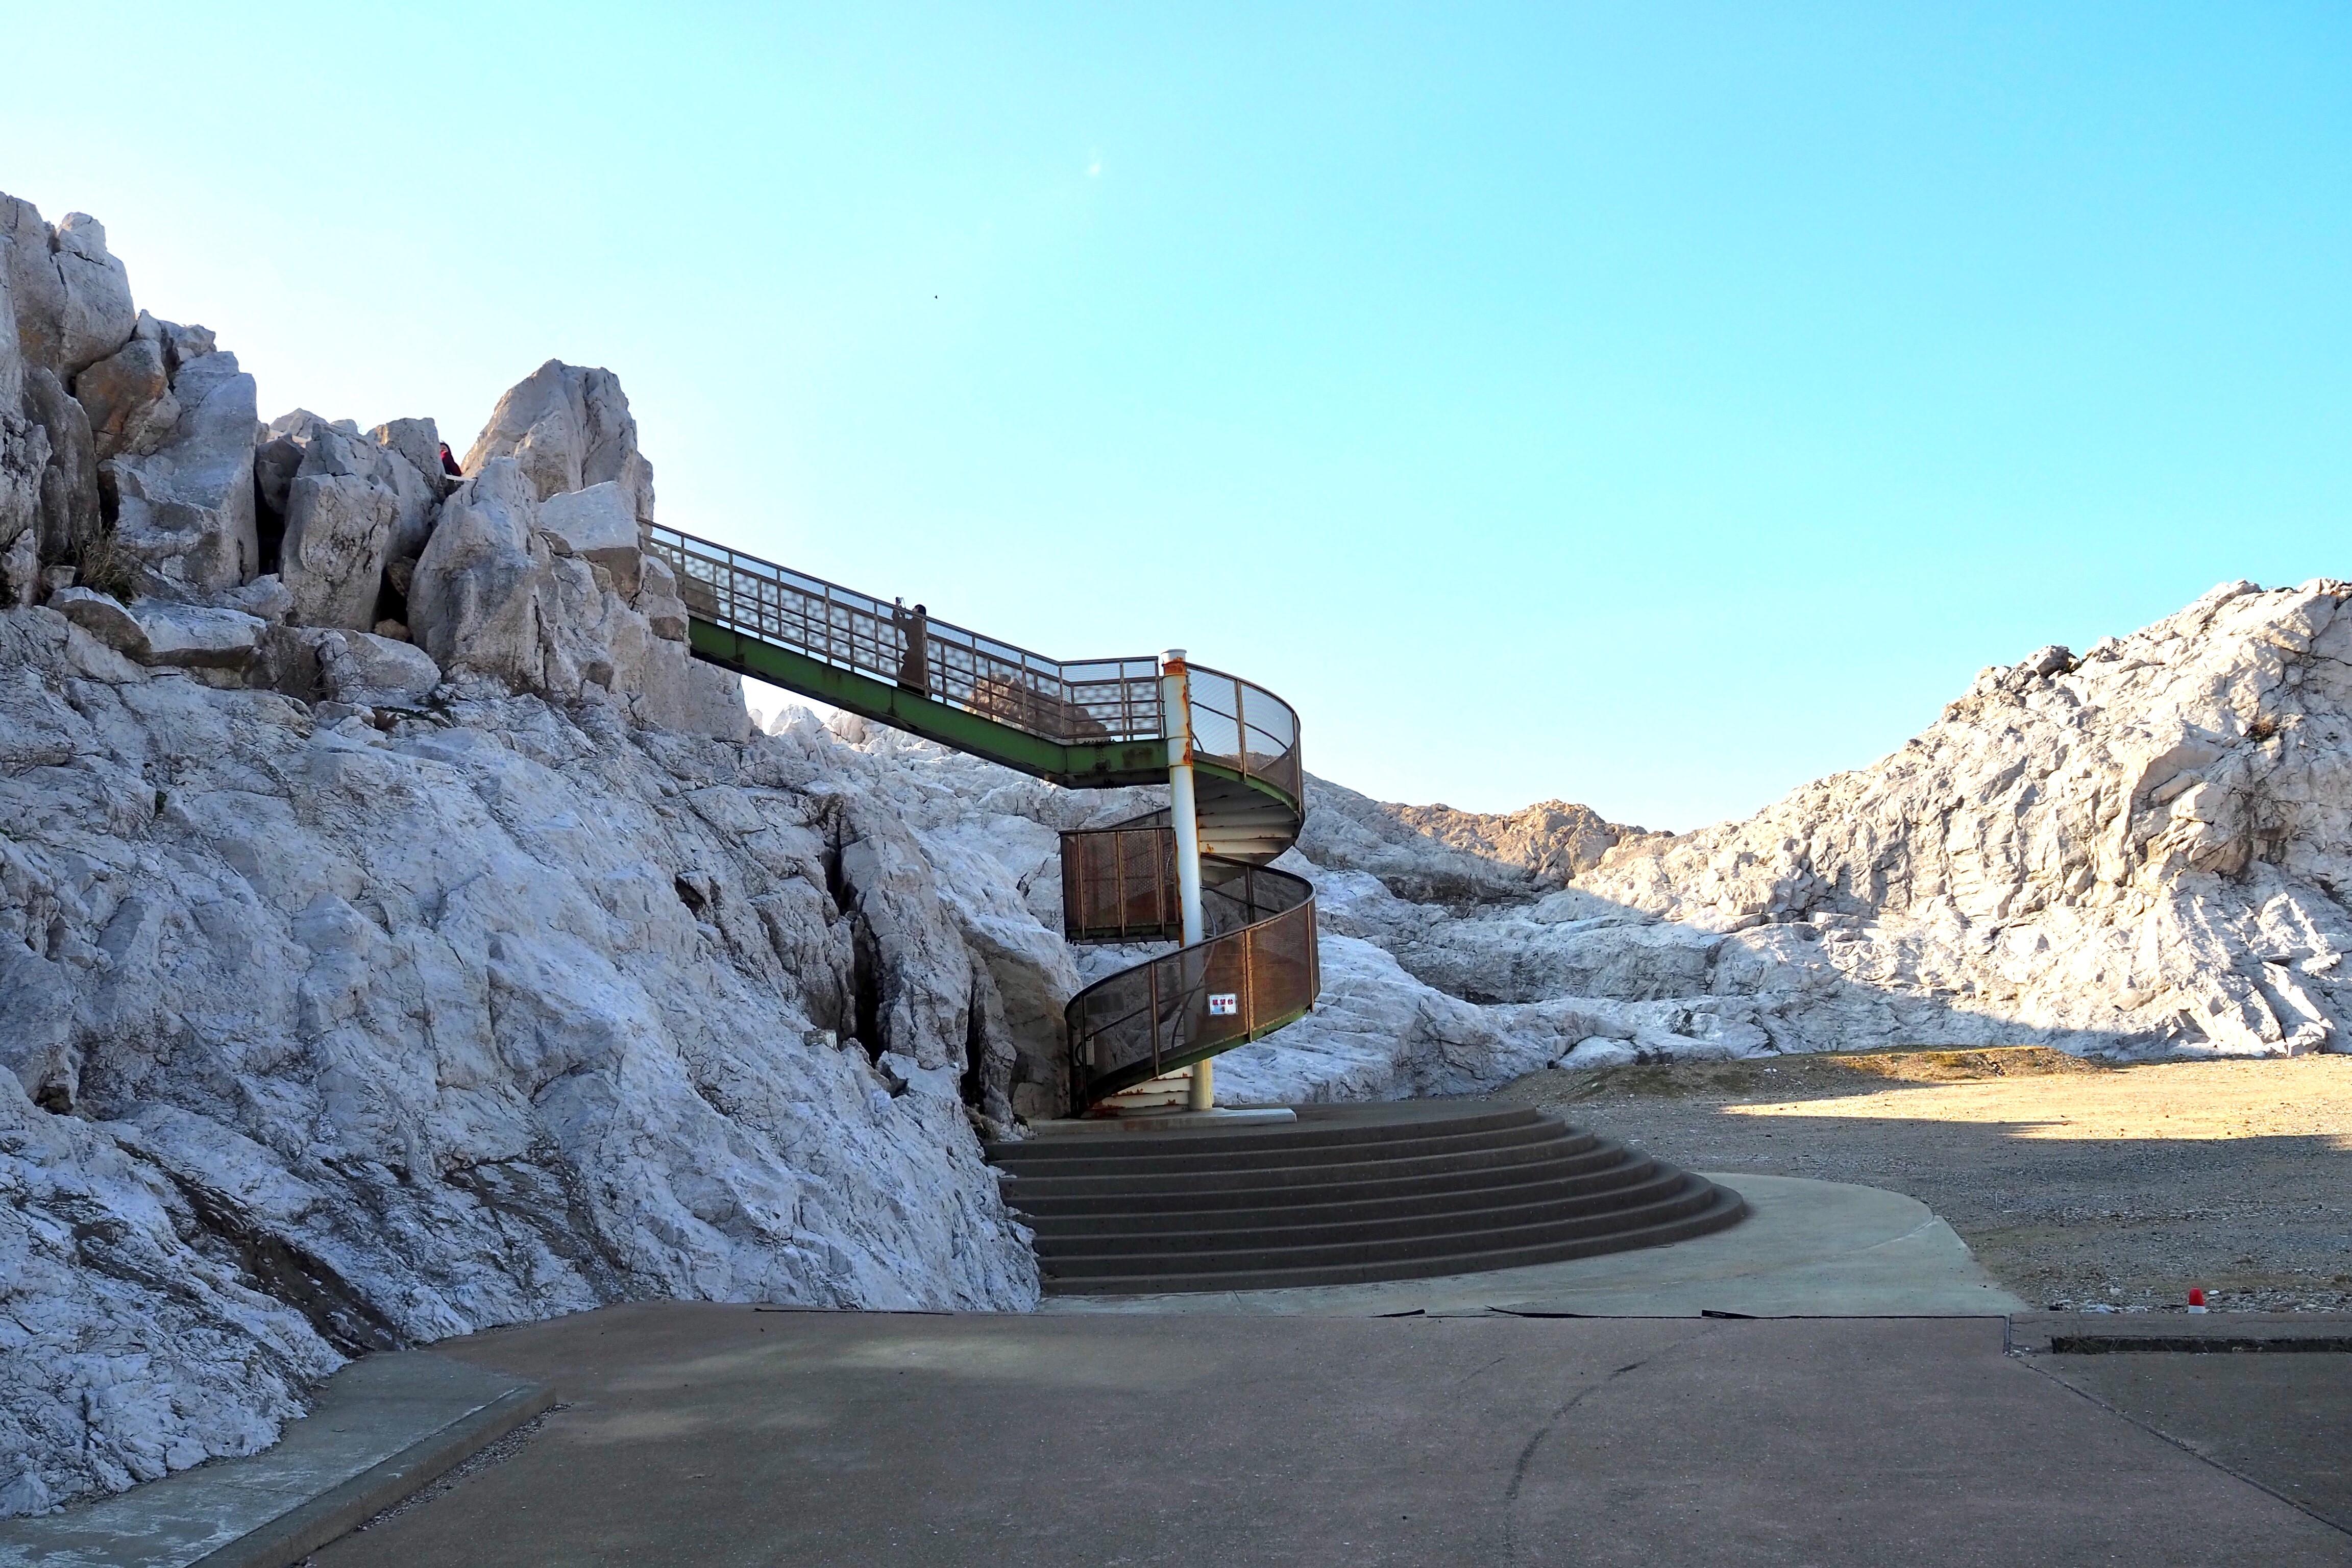 harleydavidson-motorcycle-touring-blog-wakayama-shirasakioceanpark-limestone-spiralstaircase.jpg